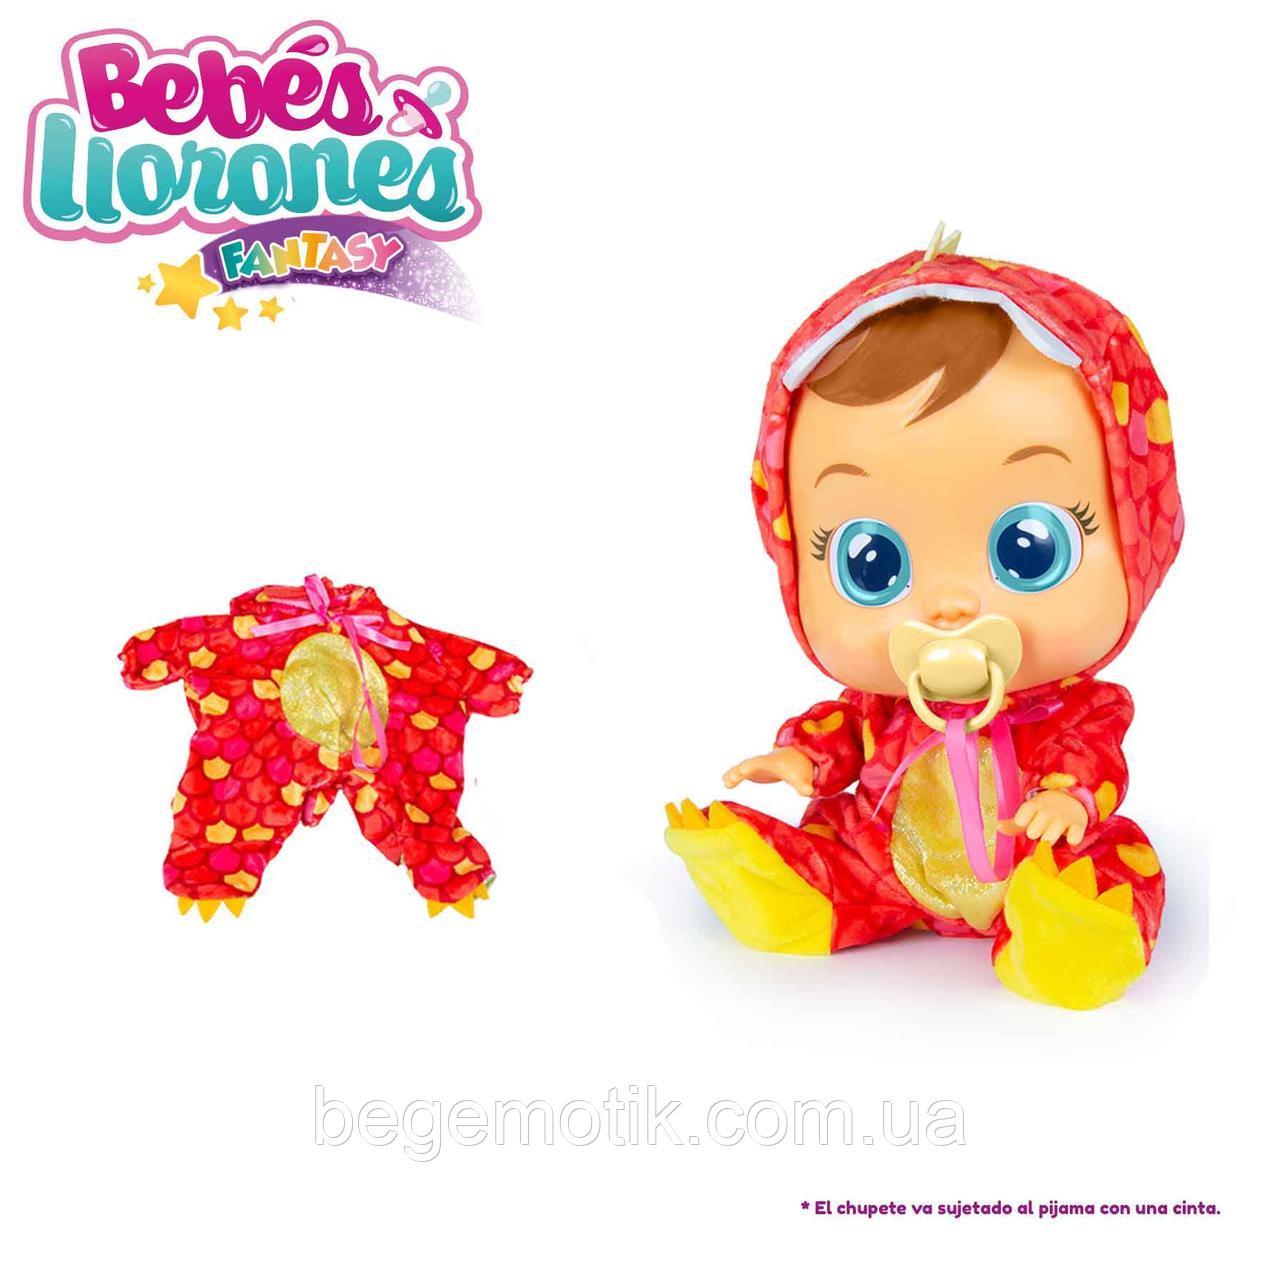 Cry Babies Костюмчик Пижама Baby Crying Fantasy Динозавра для кукол Край Беби IMC Toys 93683IM